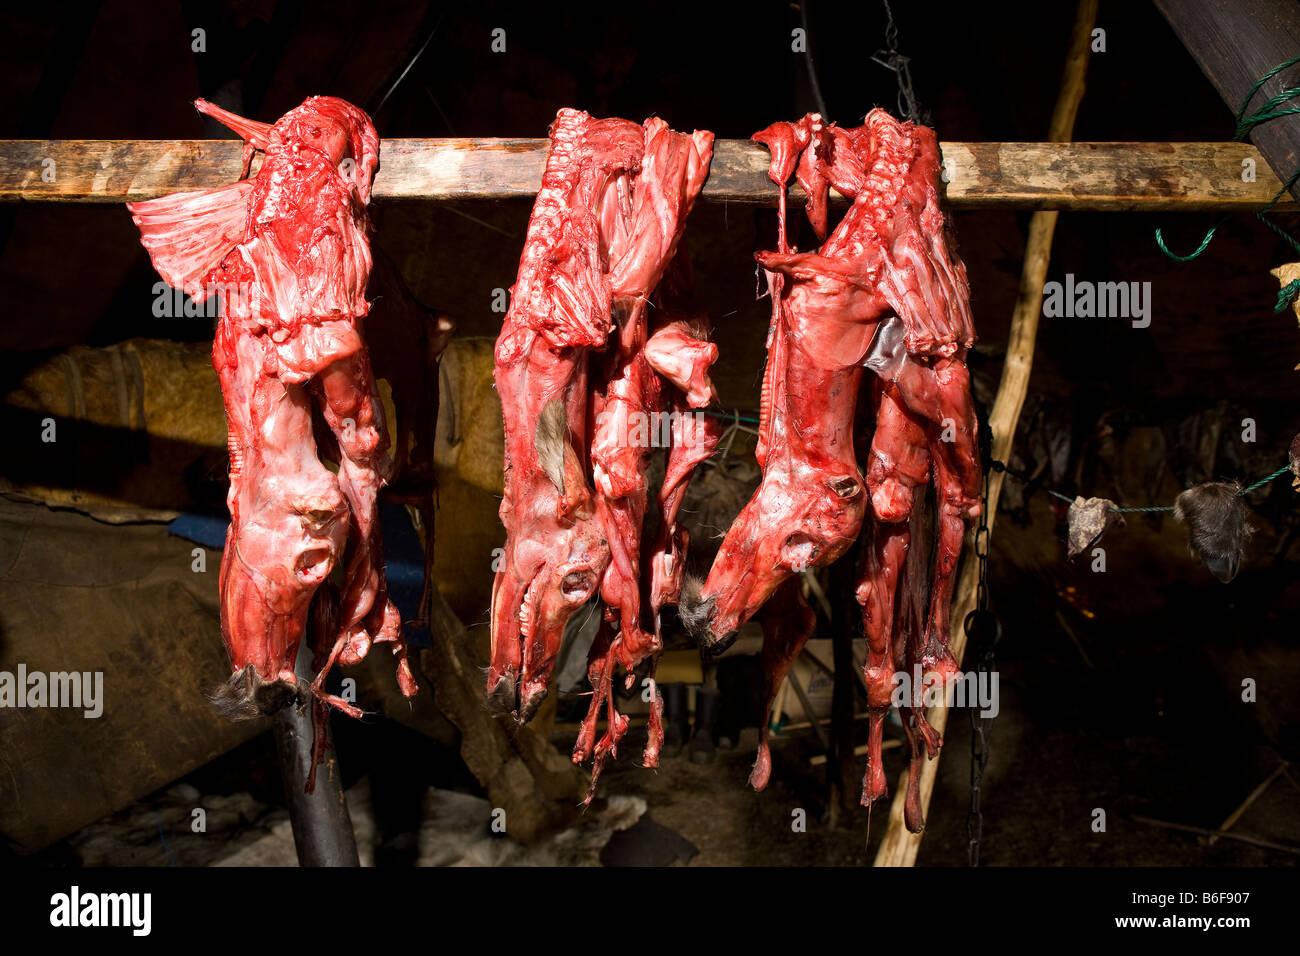 Skinned reindeer hanging in Yupic tent, Kanchalan, Siberia Russia - Stock Image